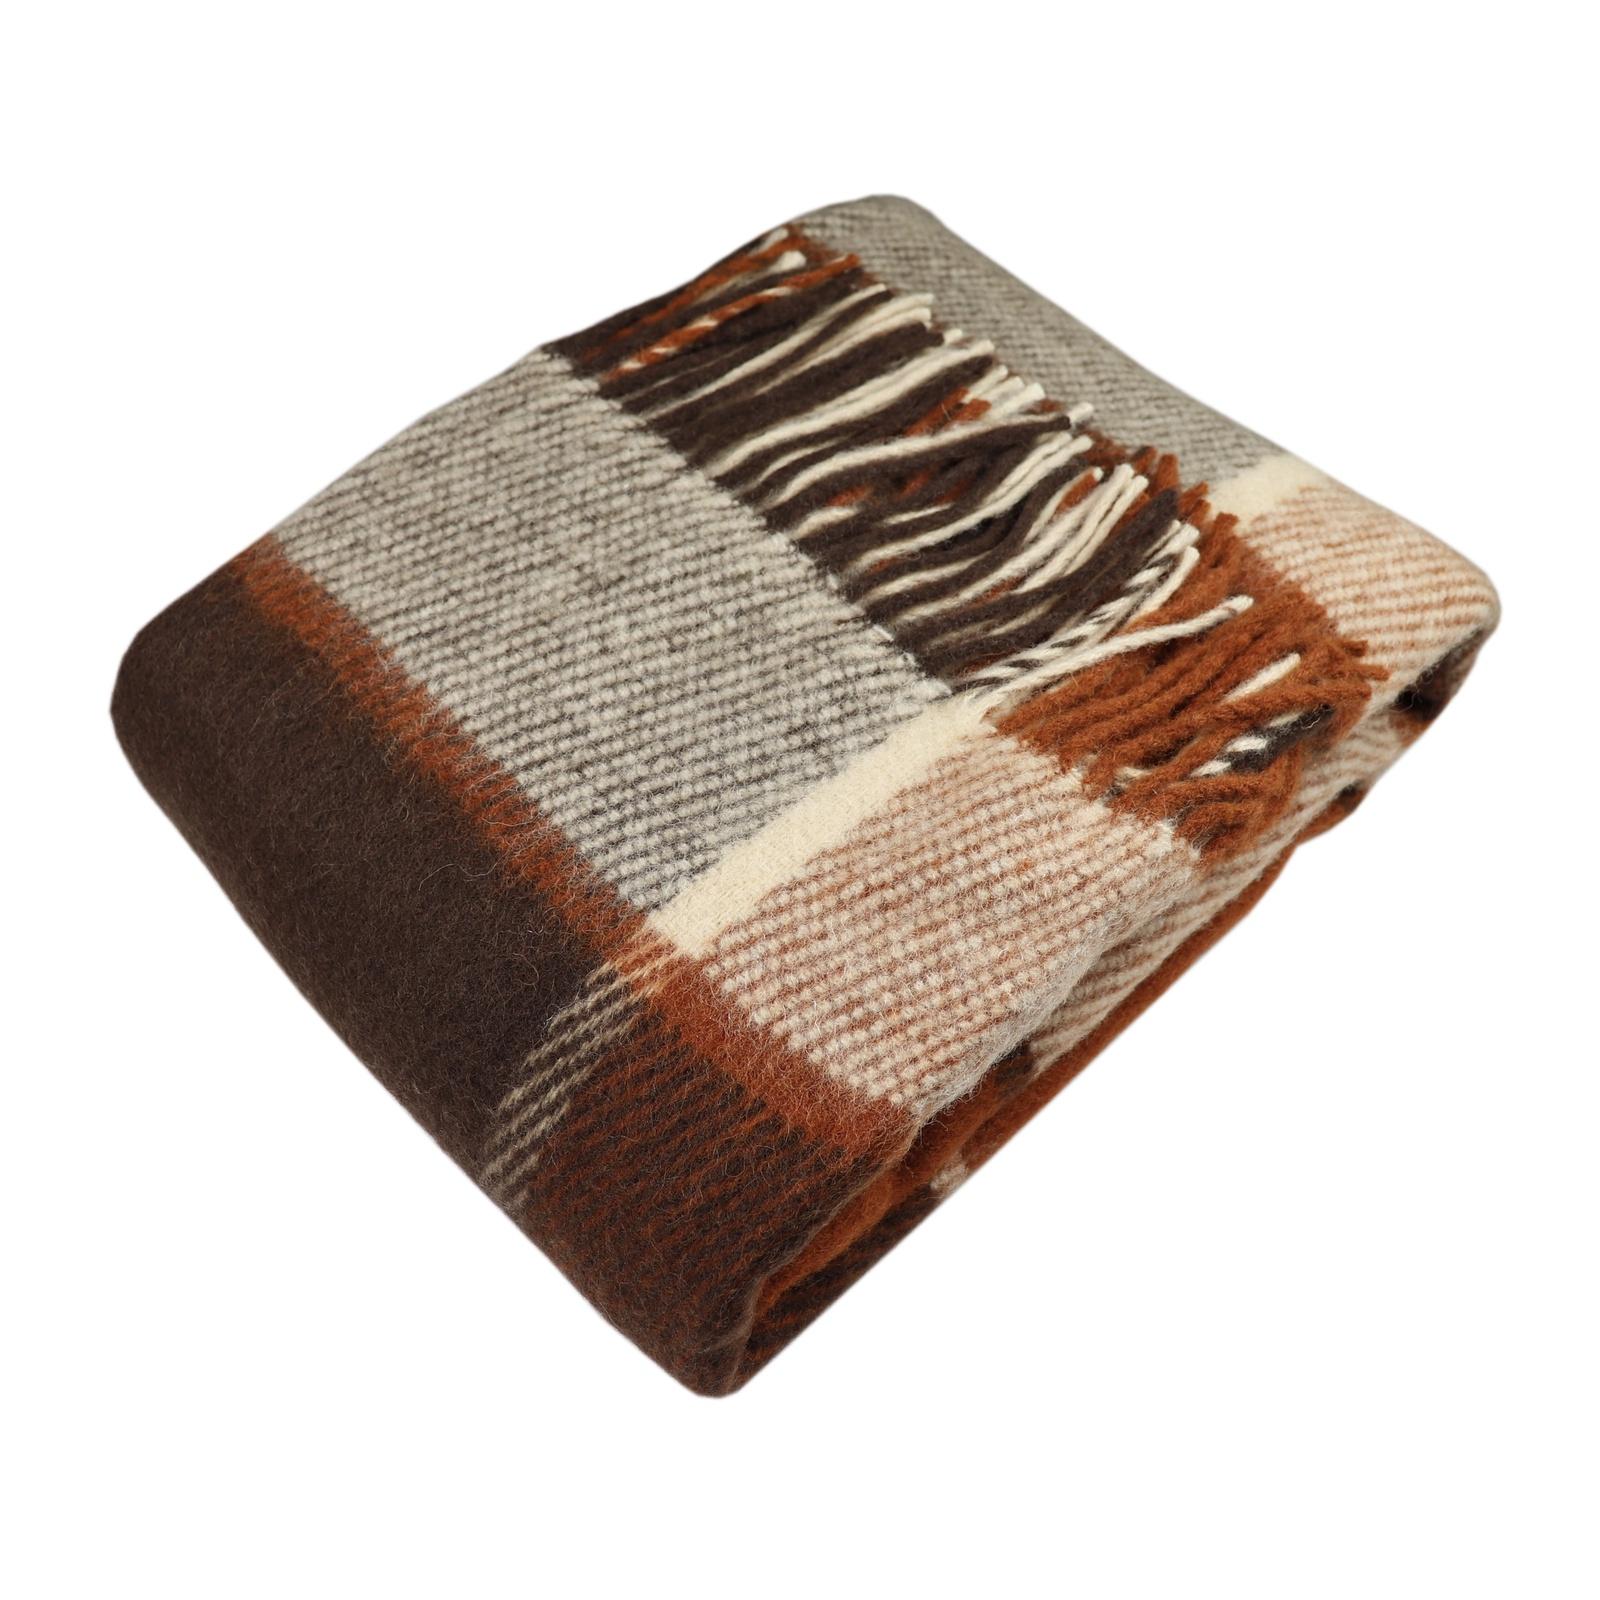 "Плед Arloni ""Традиция"", рыжий, коричневый, 130х180 см"